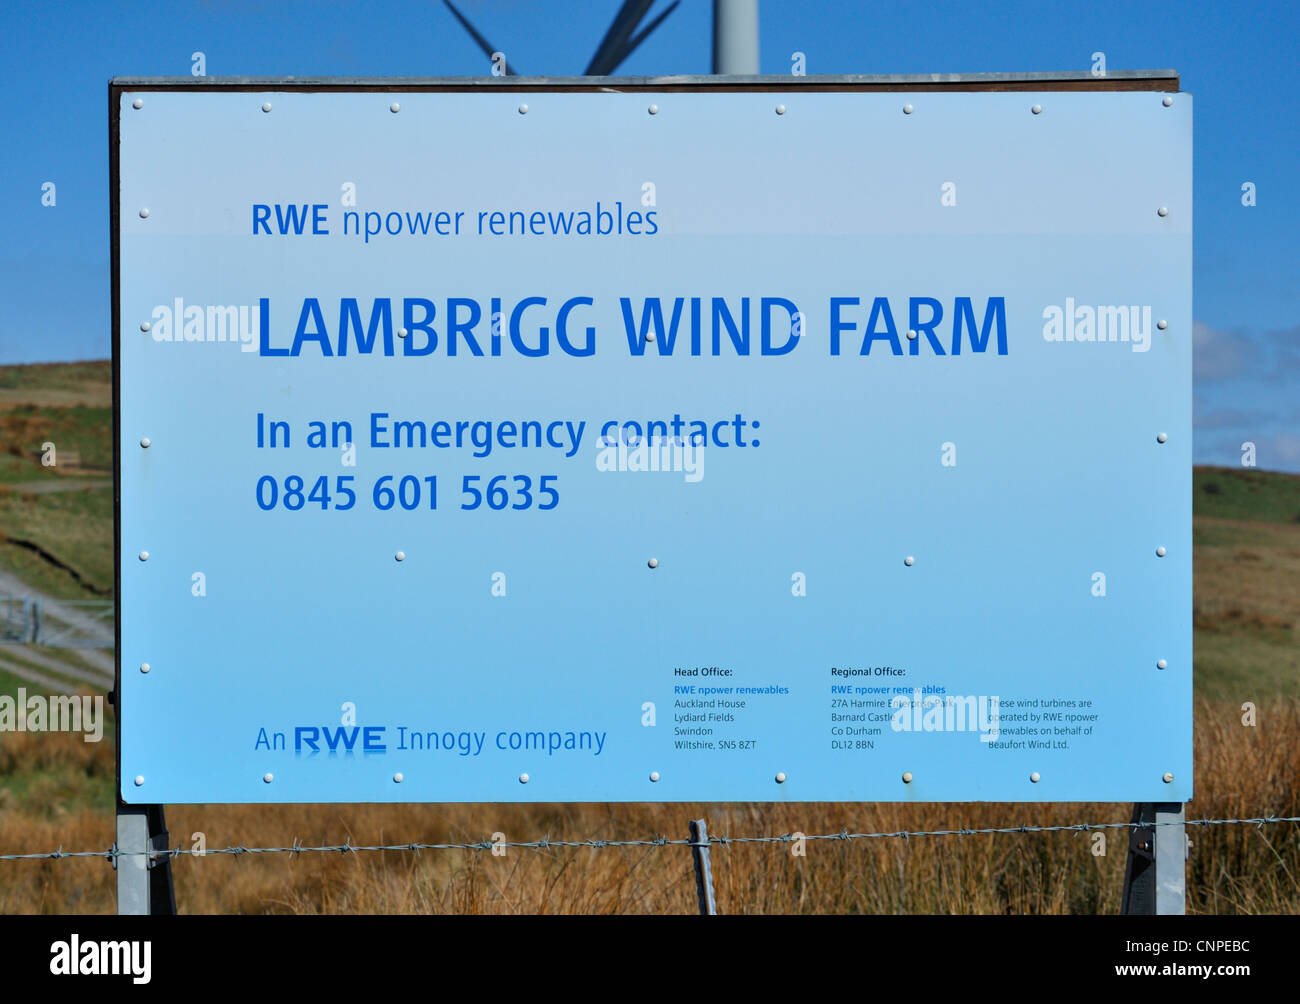 RWE npower renewables signboard. Lambrigg Wind Farm, Cumbria, England, United Kingdom, Europe. - Stock Image